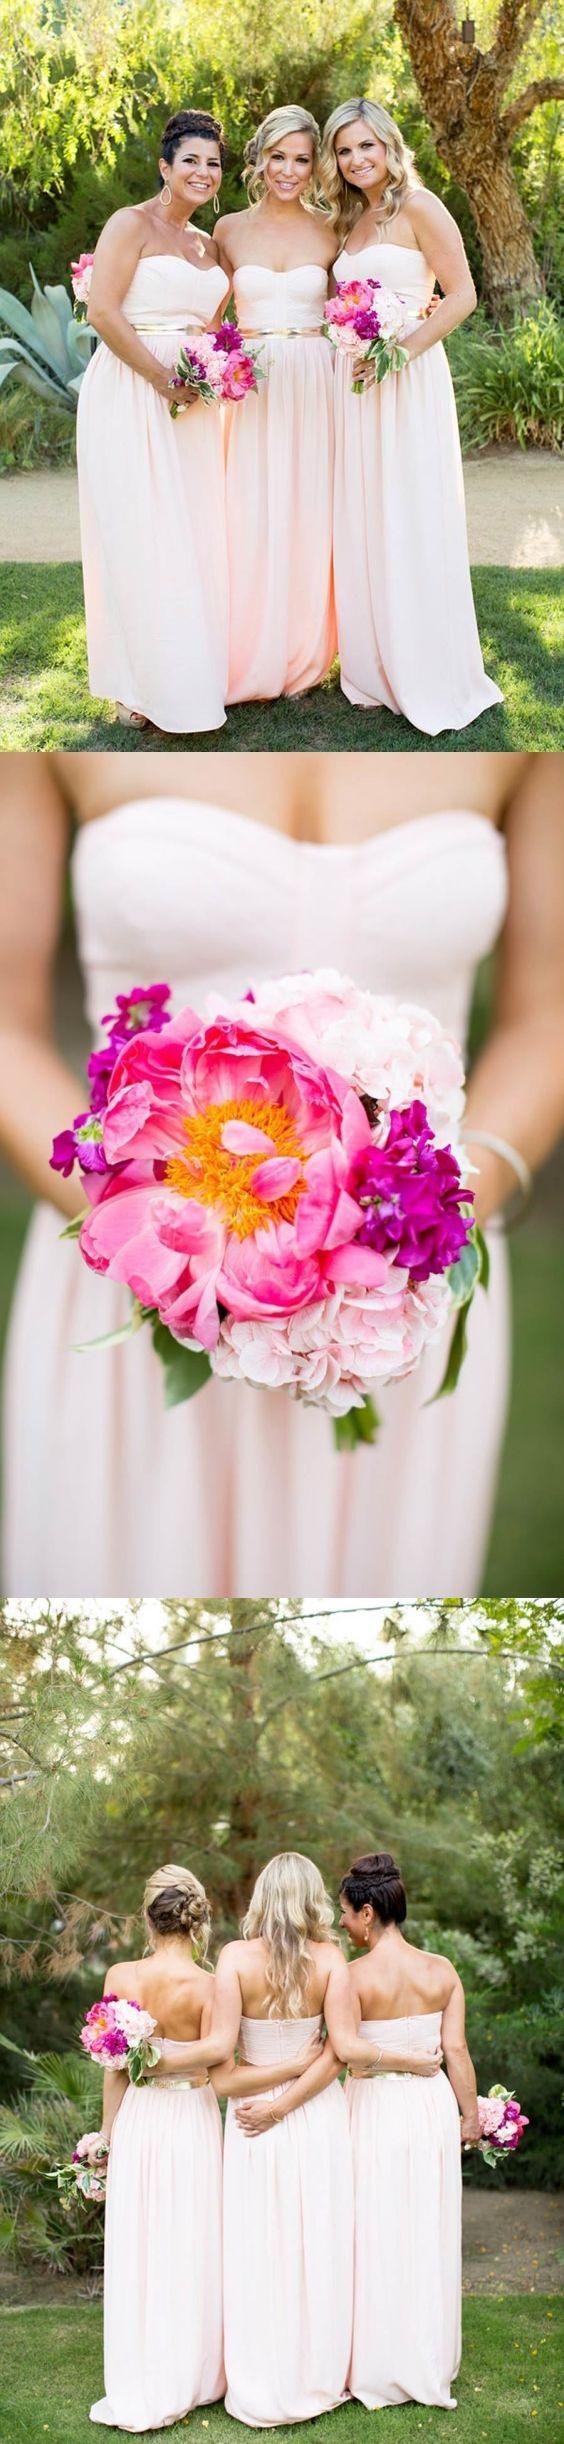 Chiffon Bridesmaid Dress, Sweet Heart Bridesmaid Dress, Dress for Wedding,  LB0814 #bridesmaids#wedding